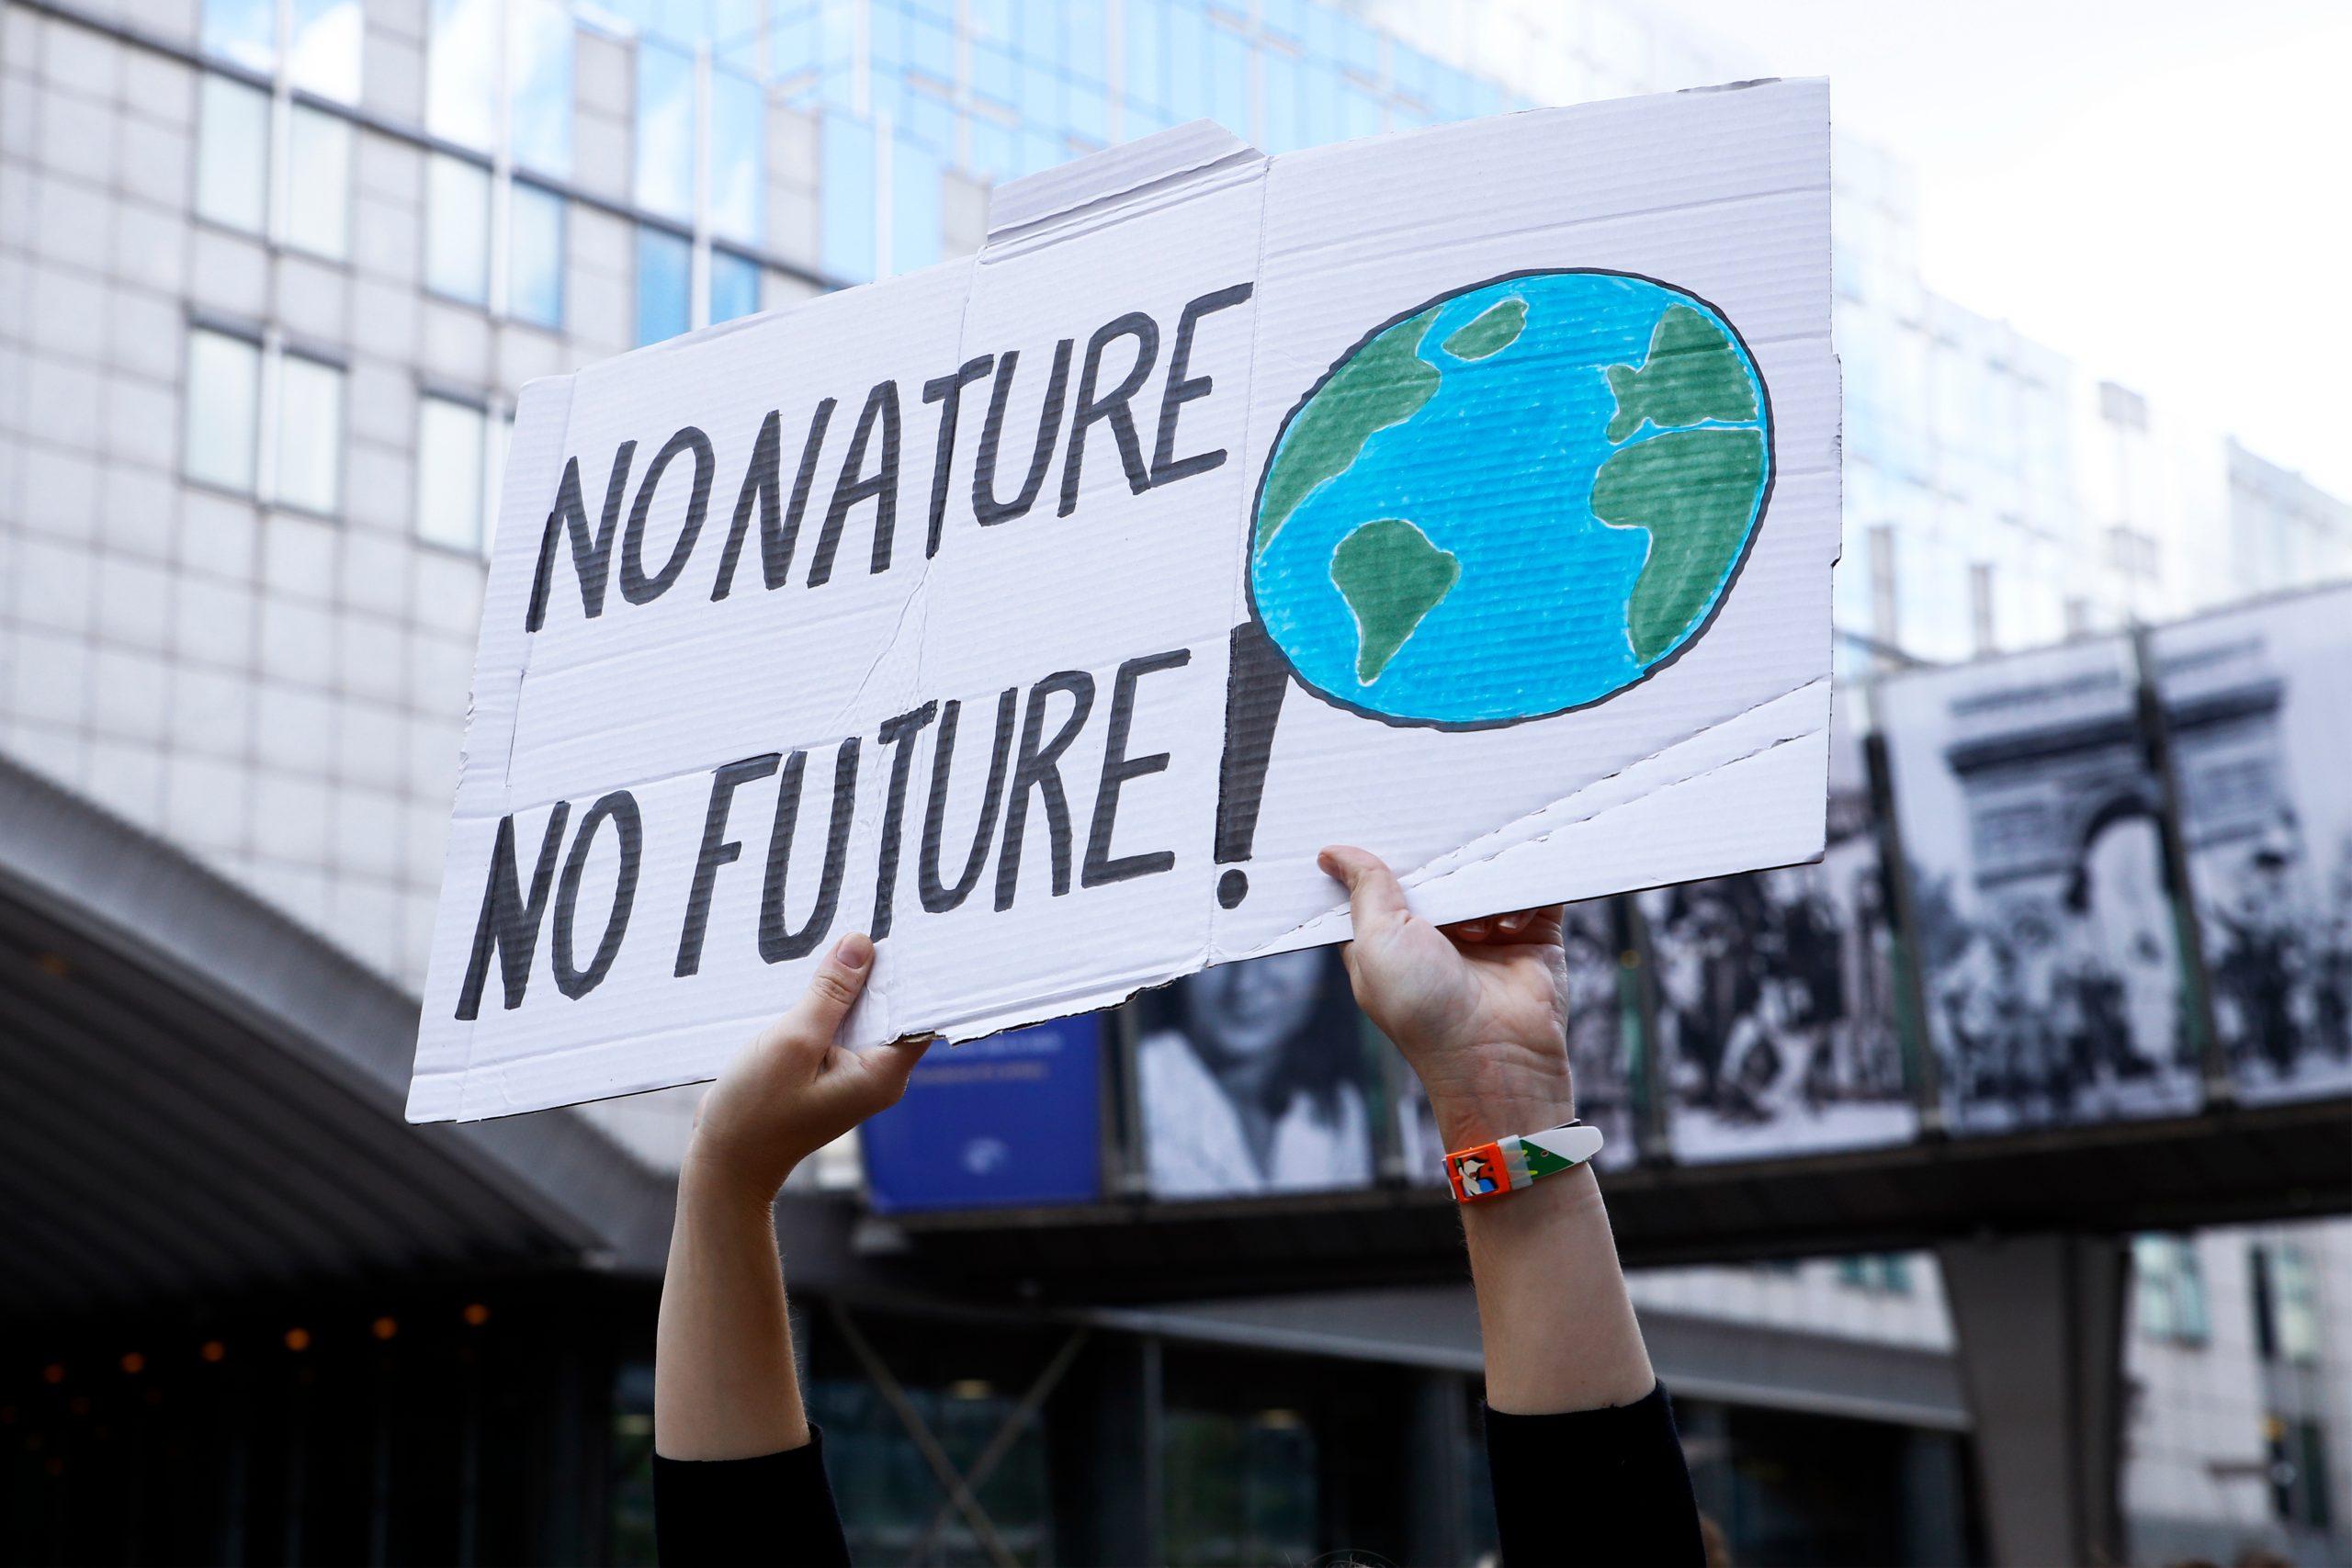 sign says no nature no future